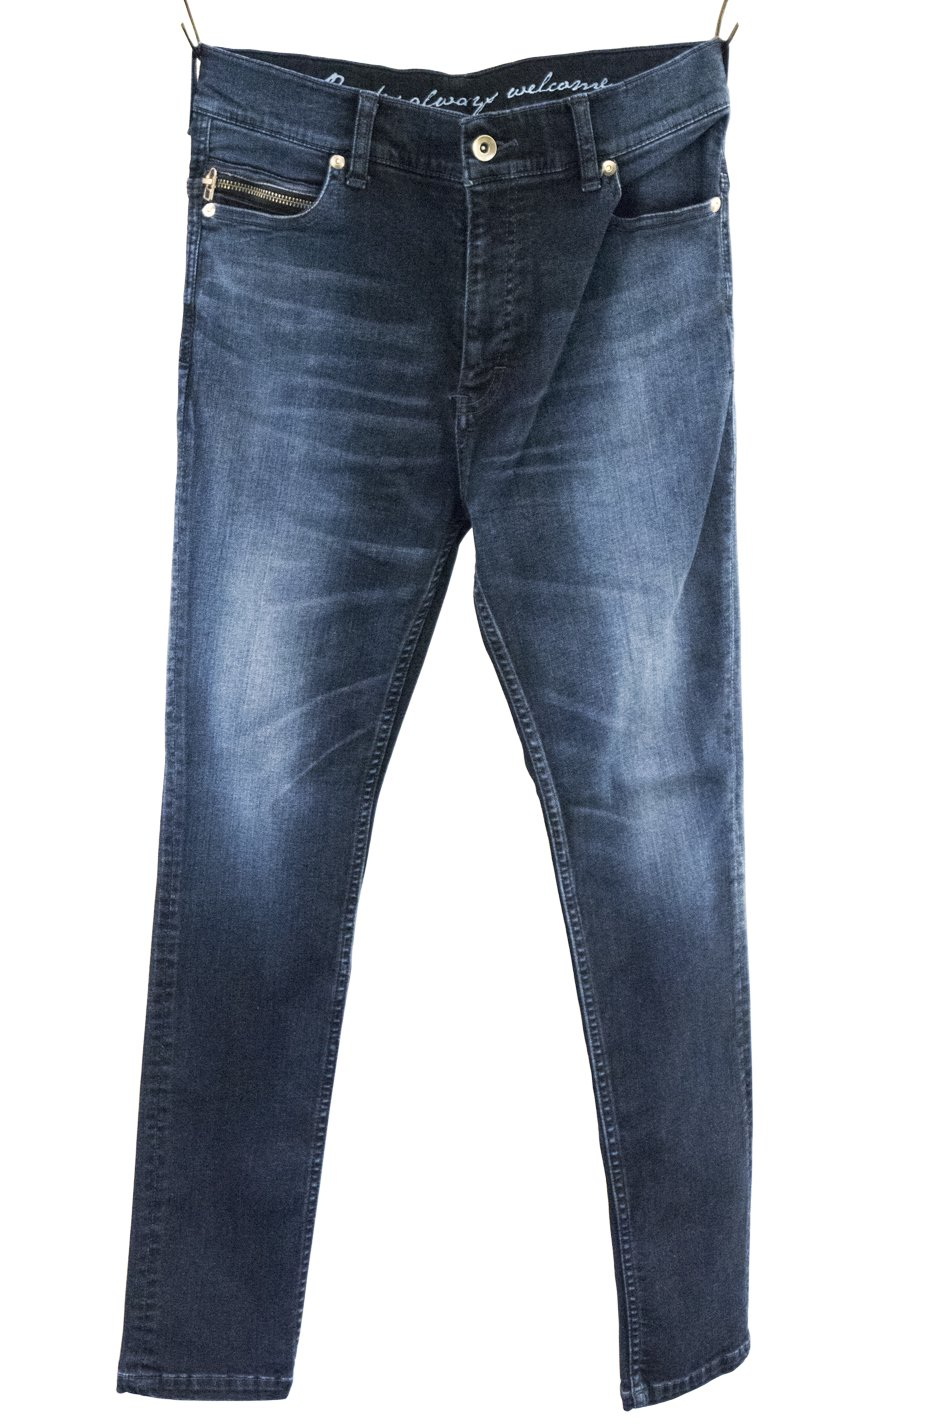 Super ST Denim Pants Thunders/USED